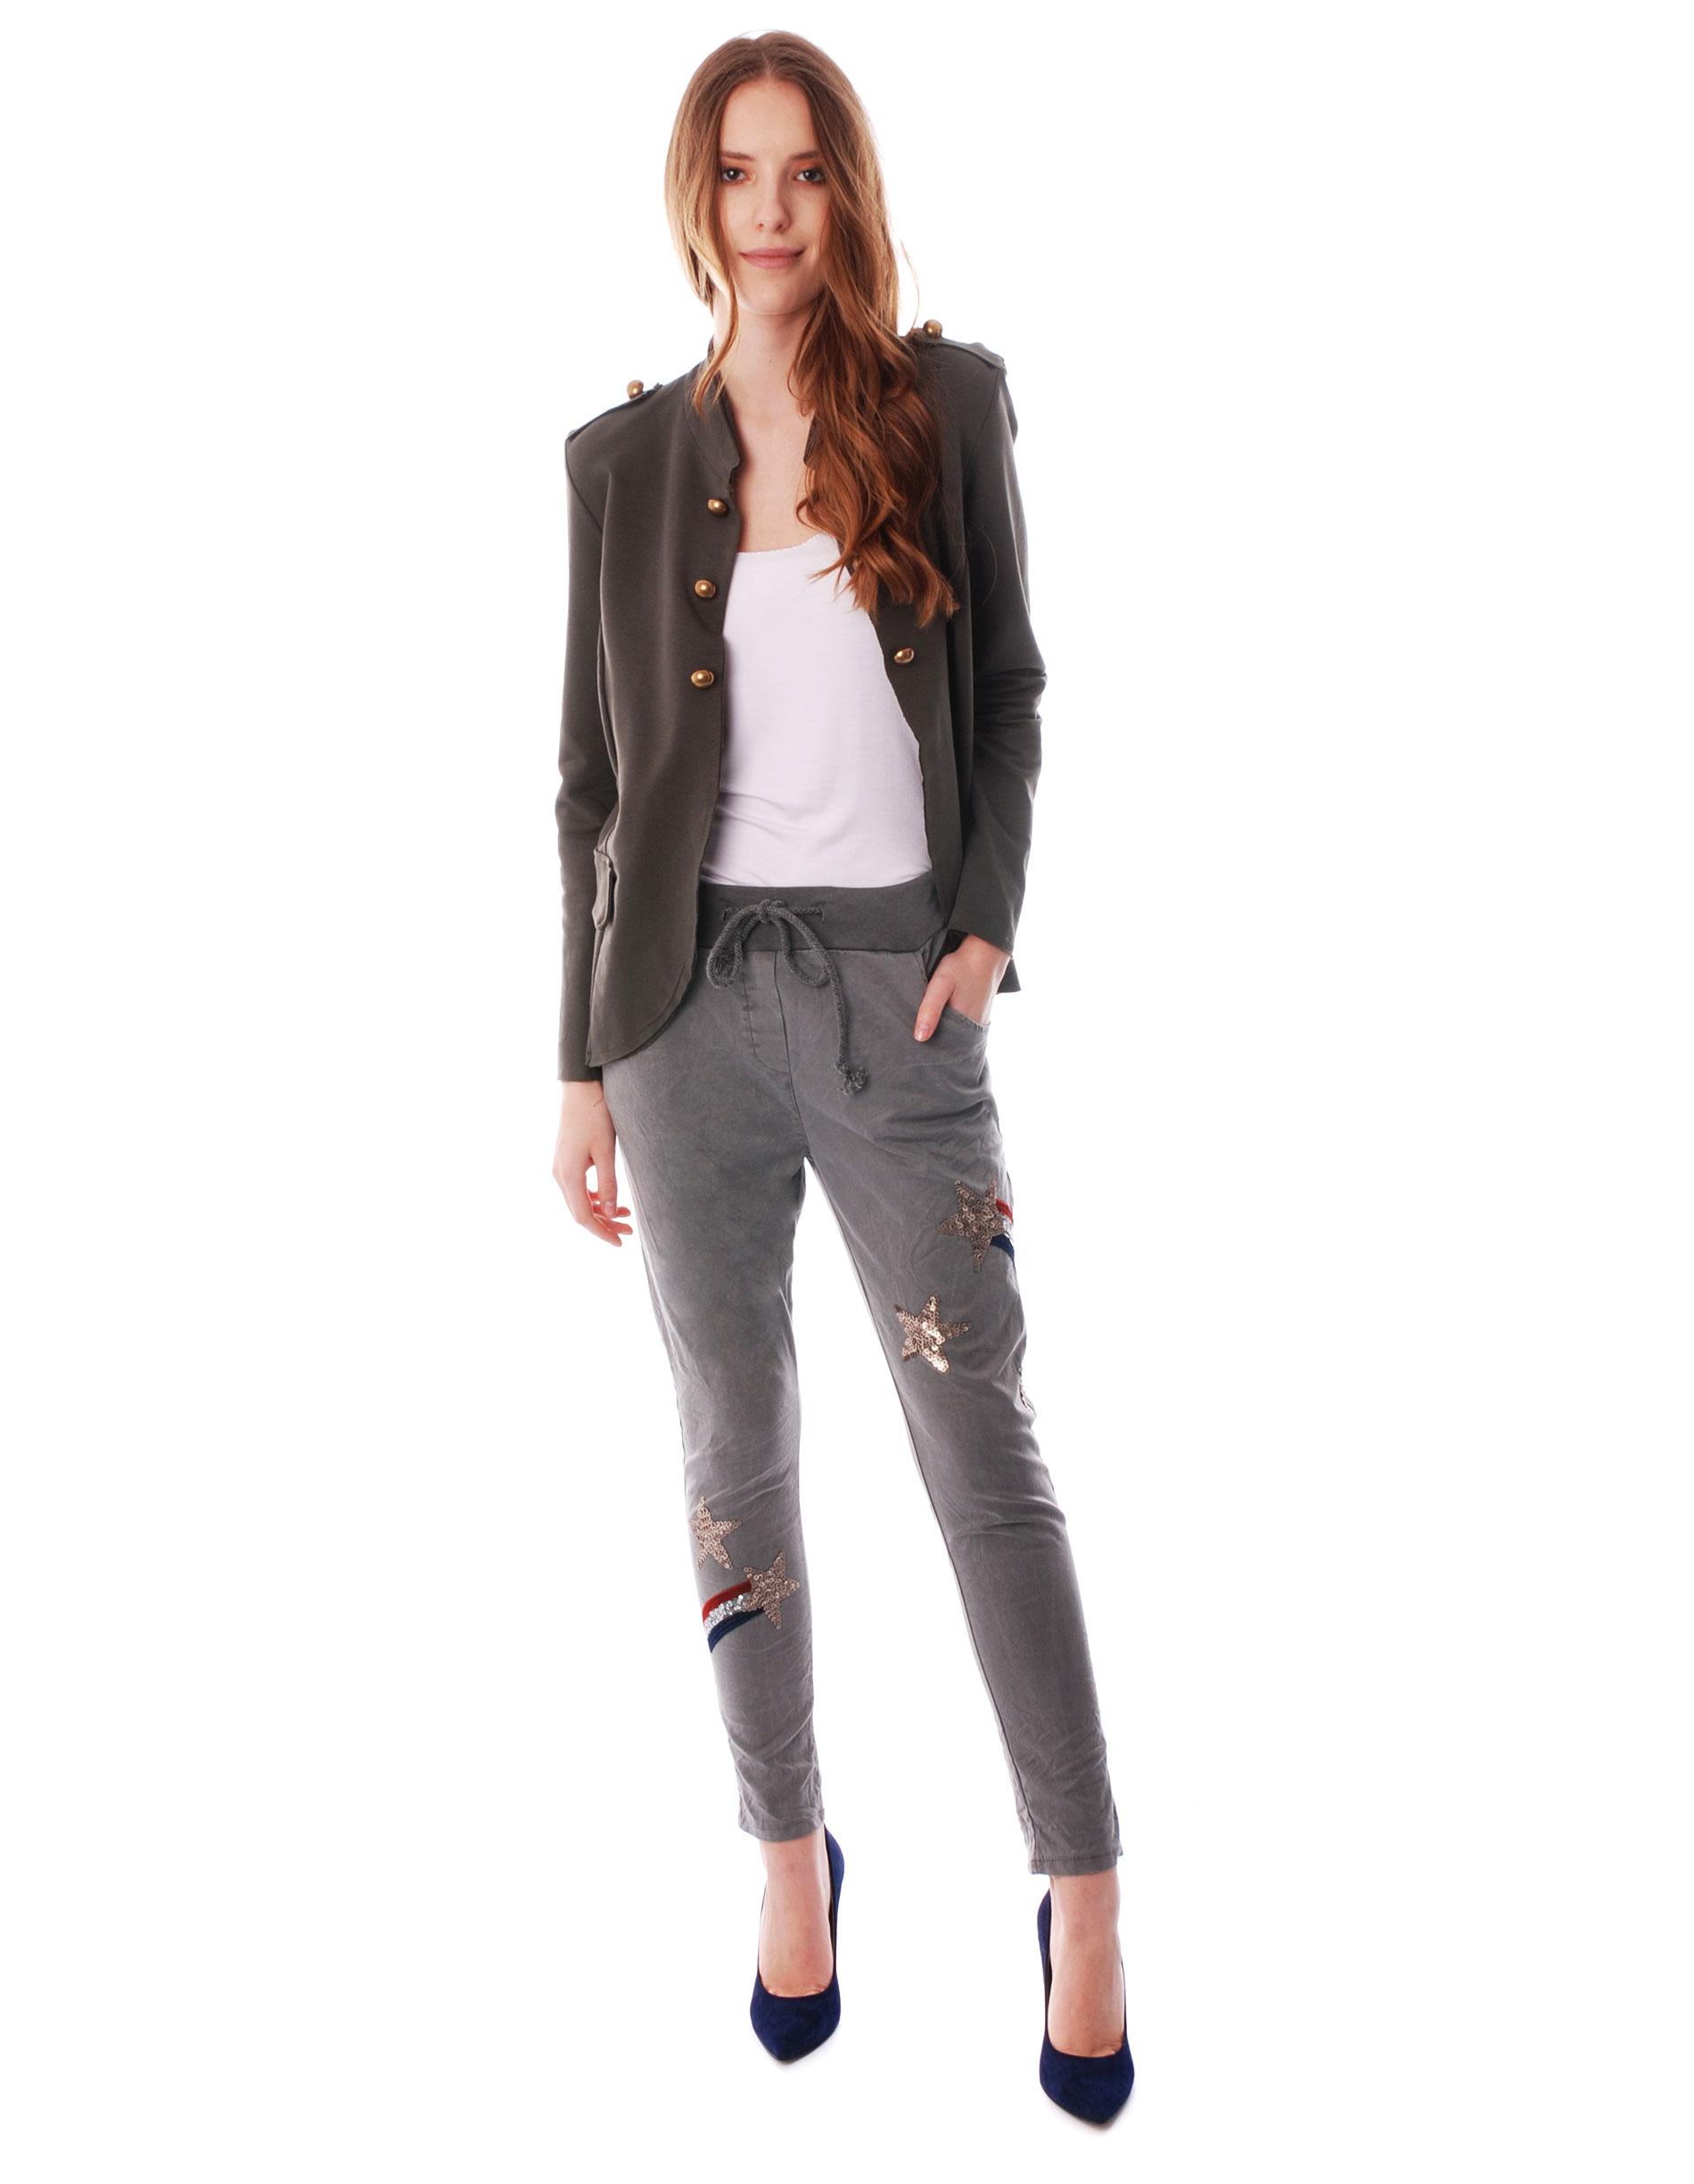 Spodnie - 141-P007 GRME - Unisono